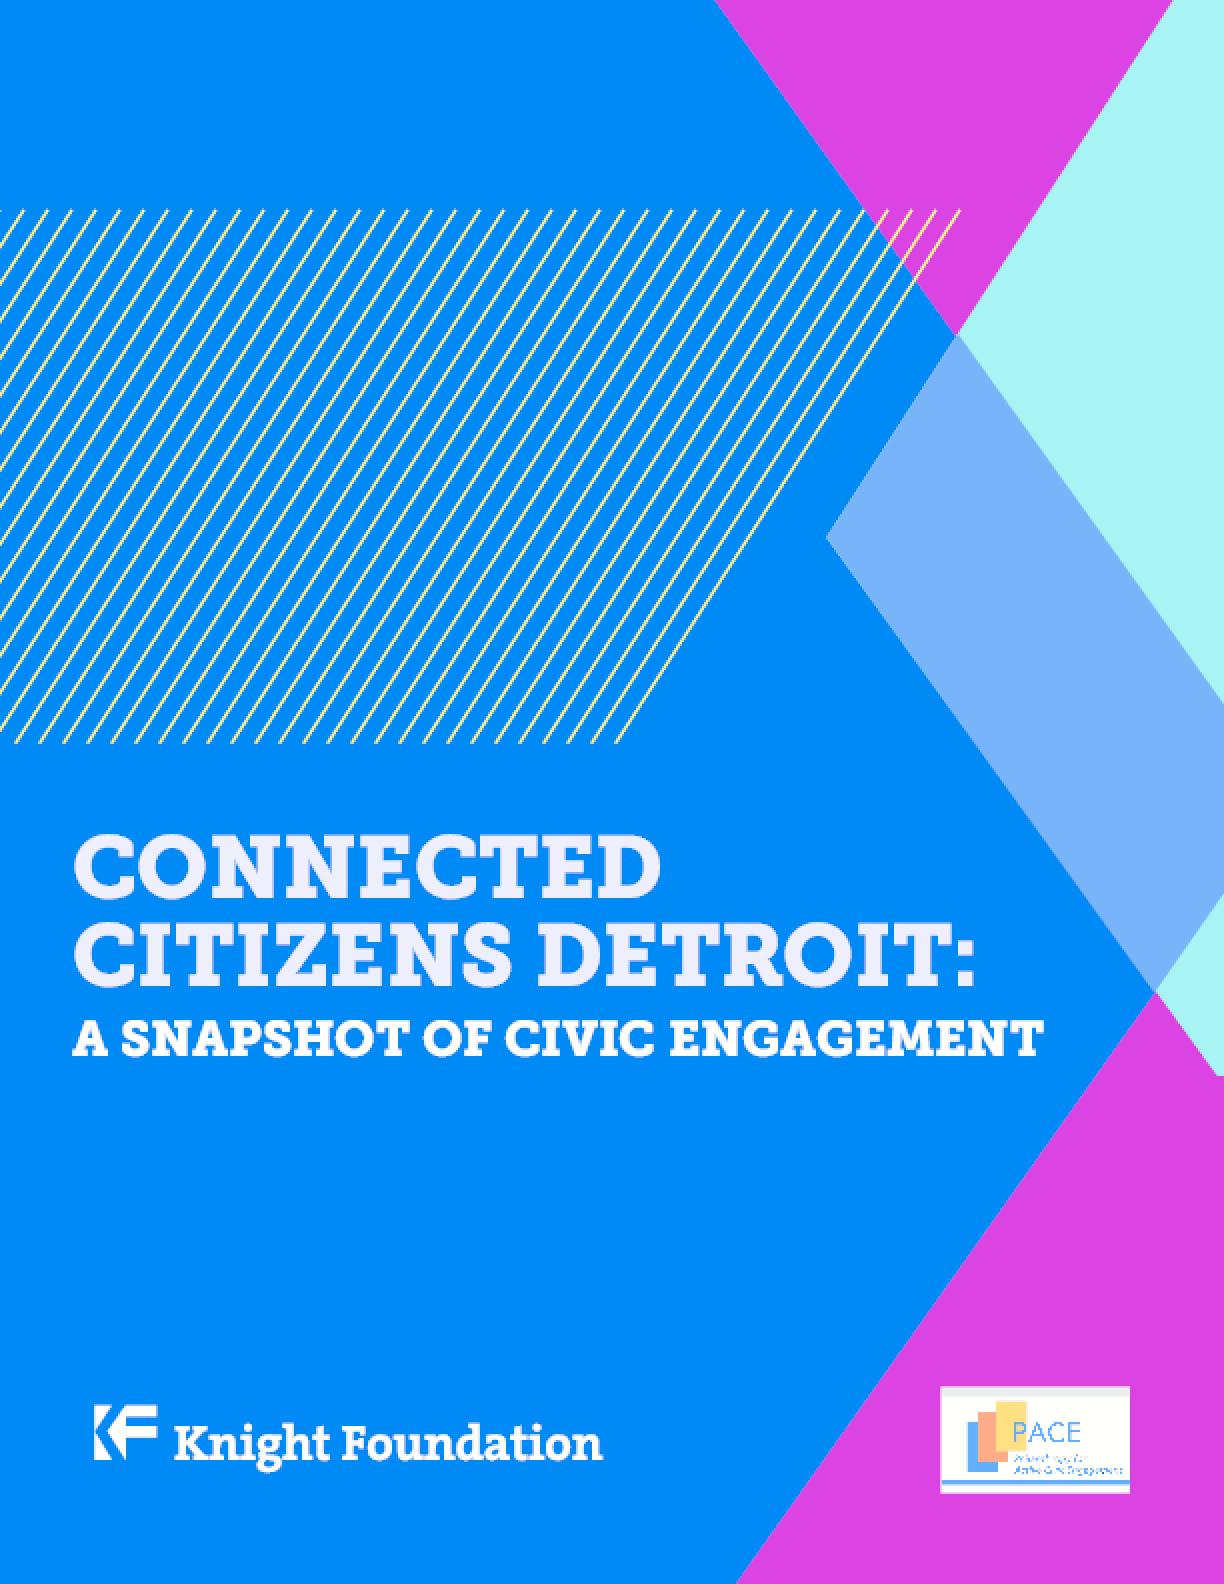 Connected Citizens Detroit: A Snapshot of Civic Engagement